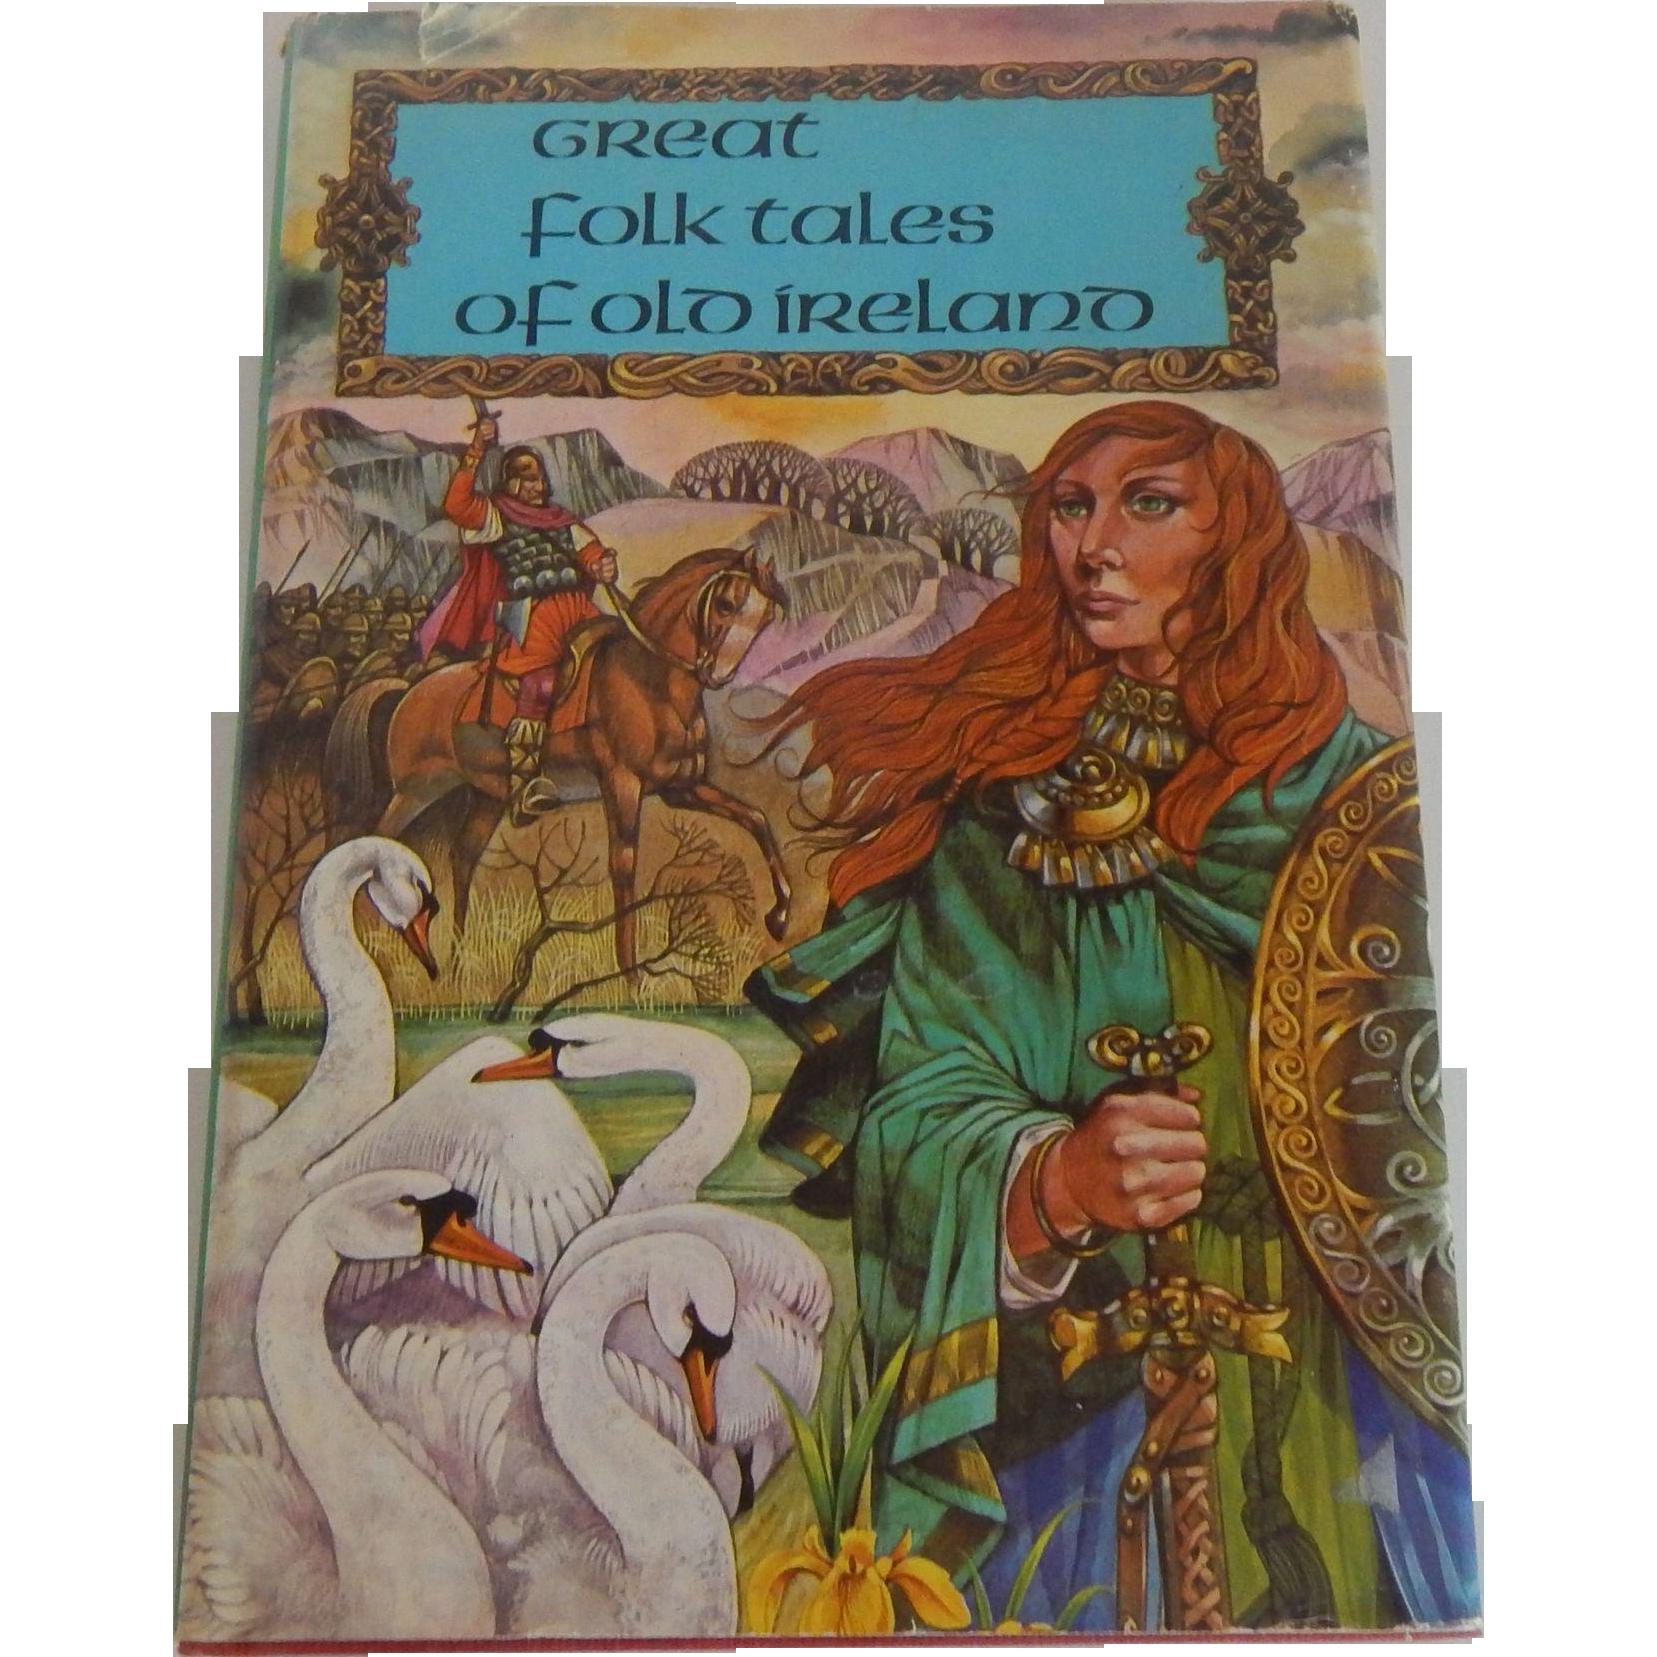 Great Folk Tales of Old Ireland